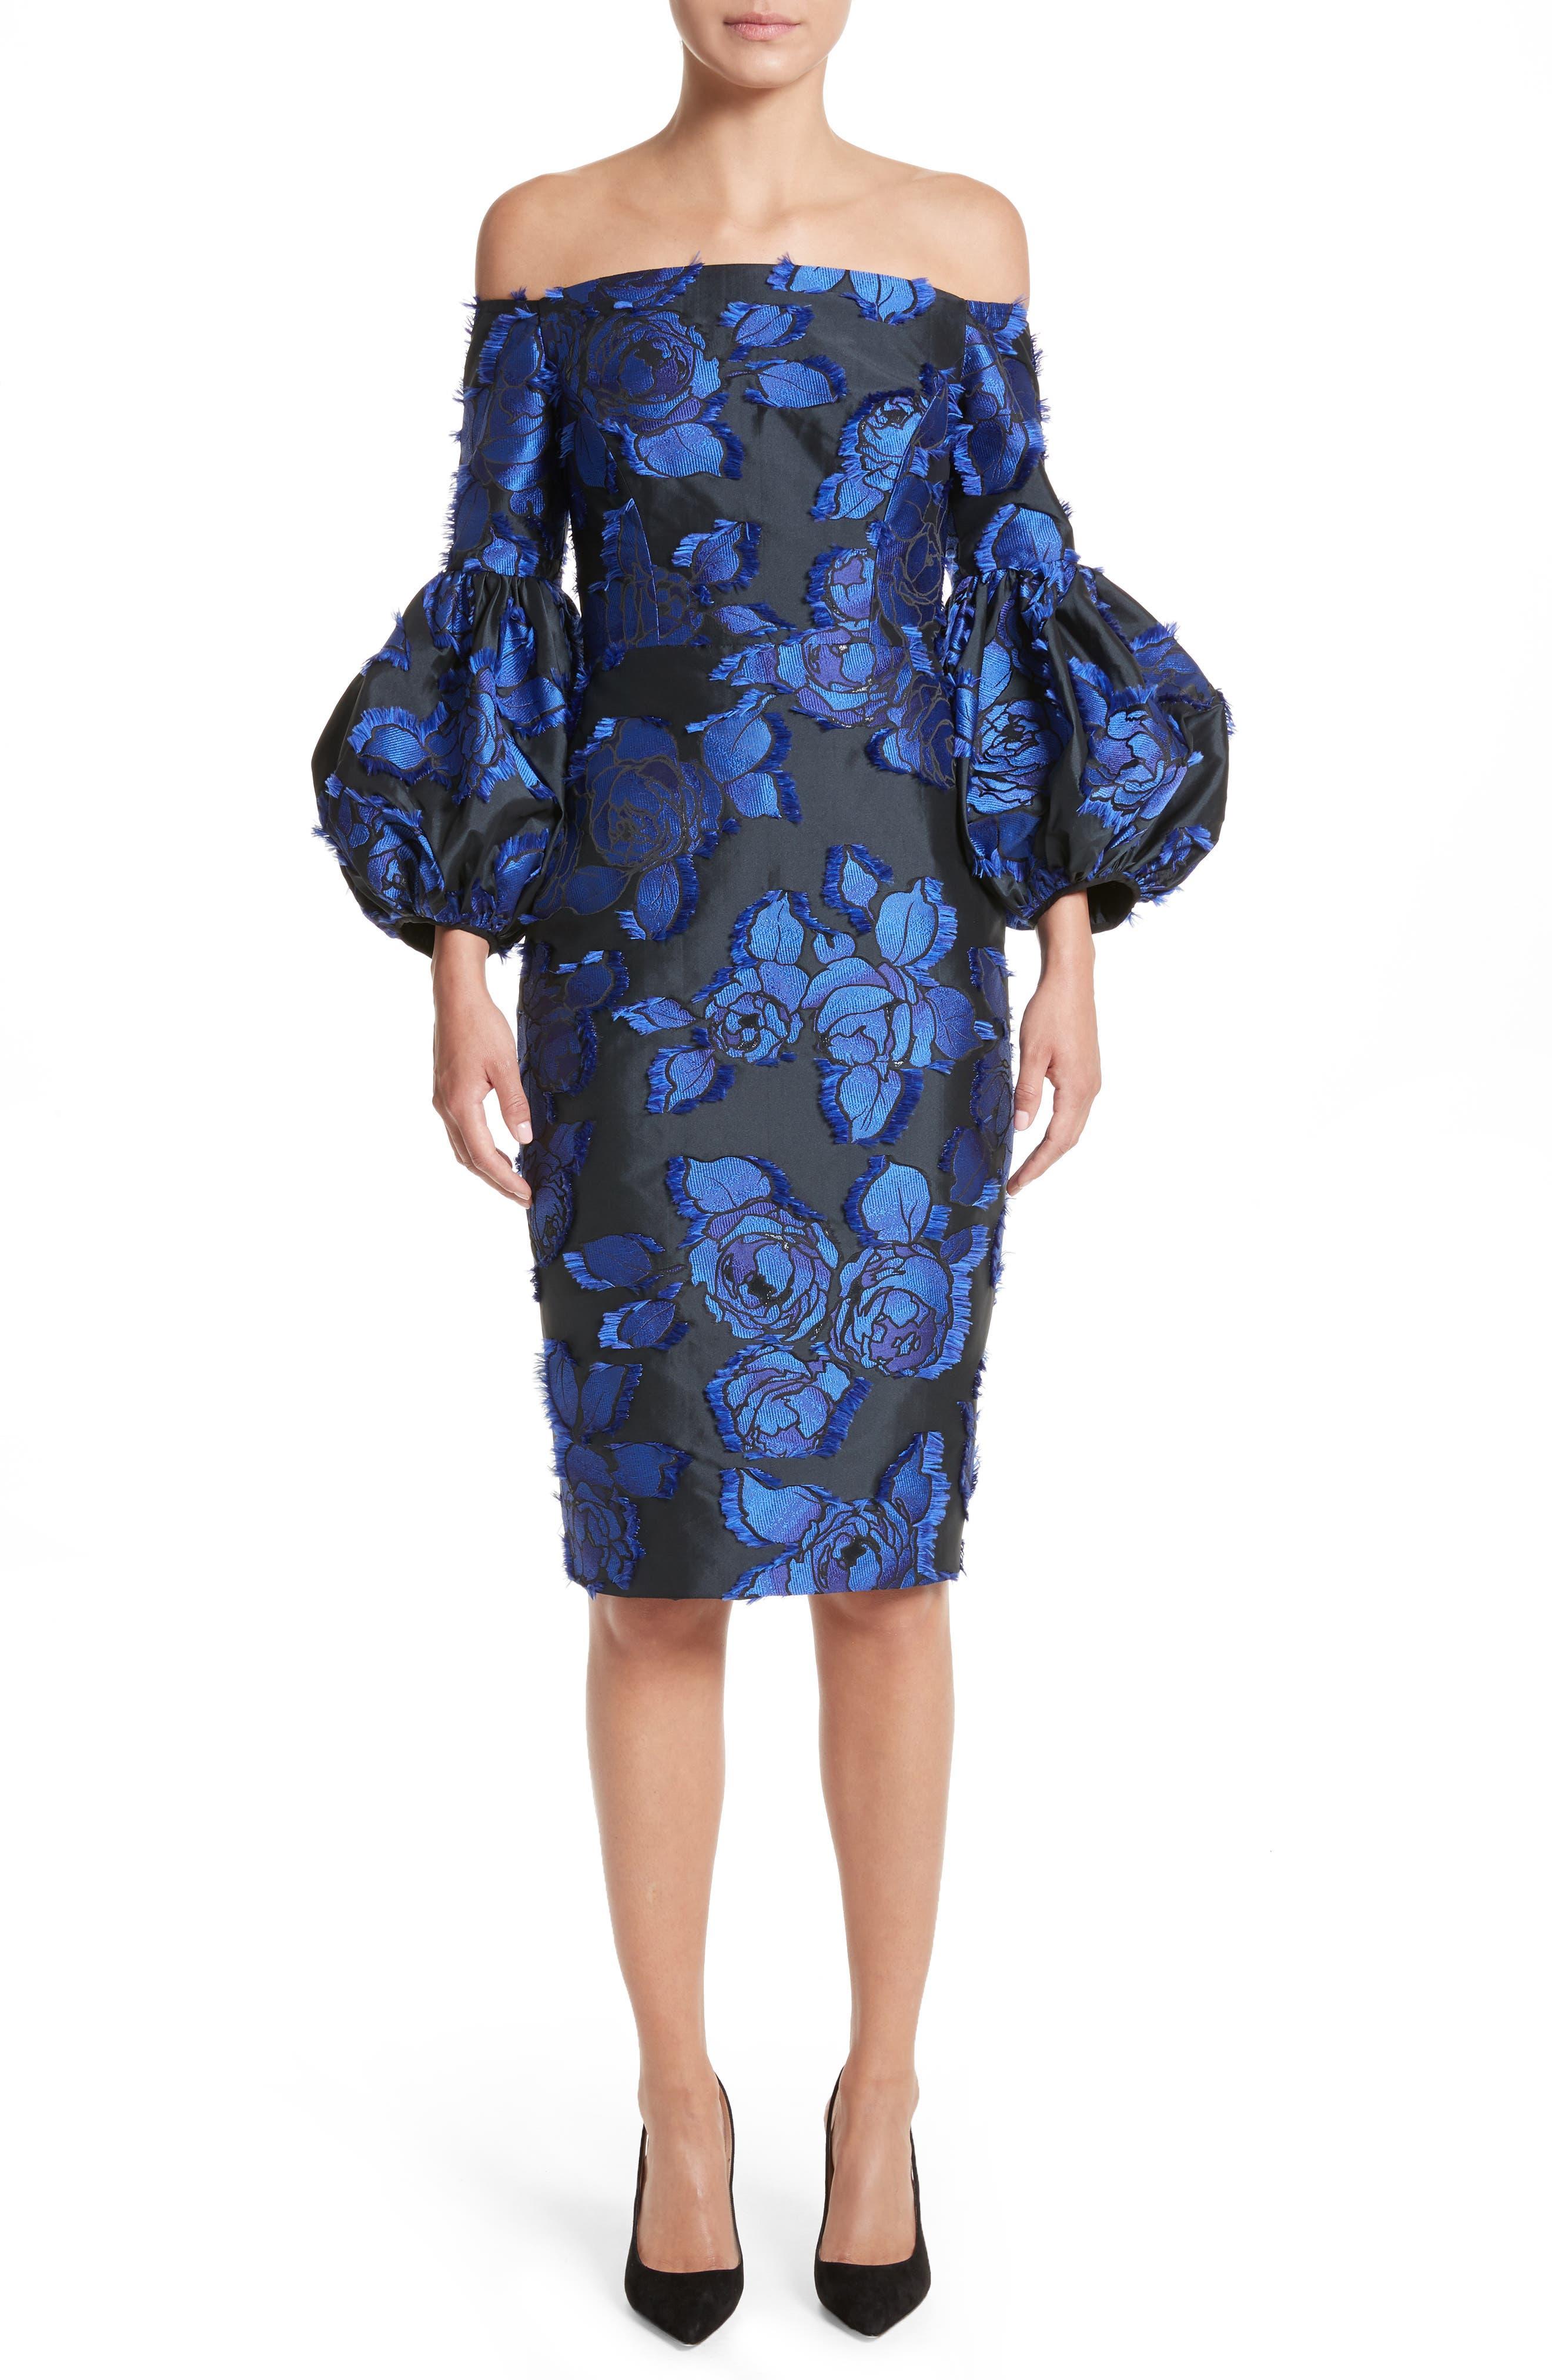 Fring Brocade Puff Sleeve Dress,                             Main thumbnail 1, color,                             Black/ Lapis